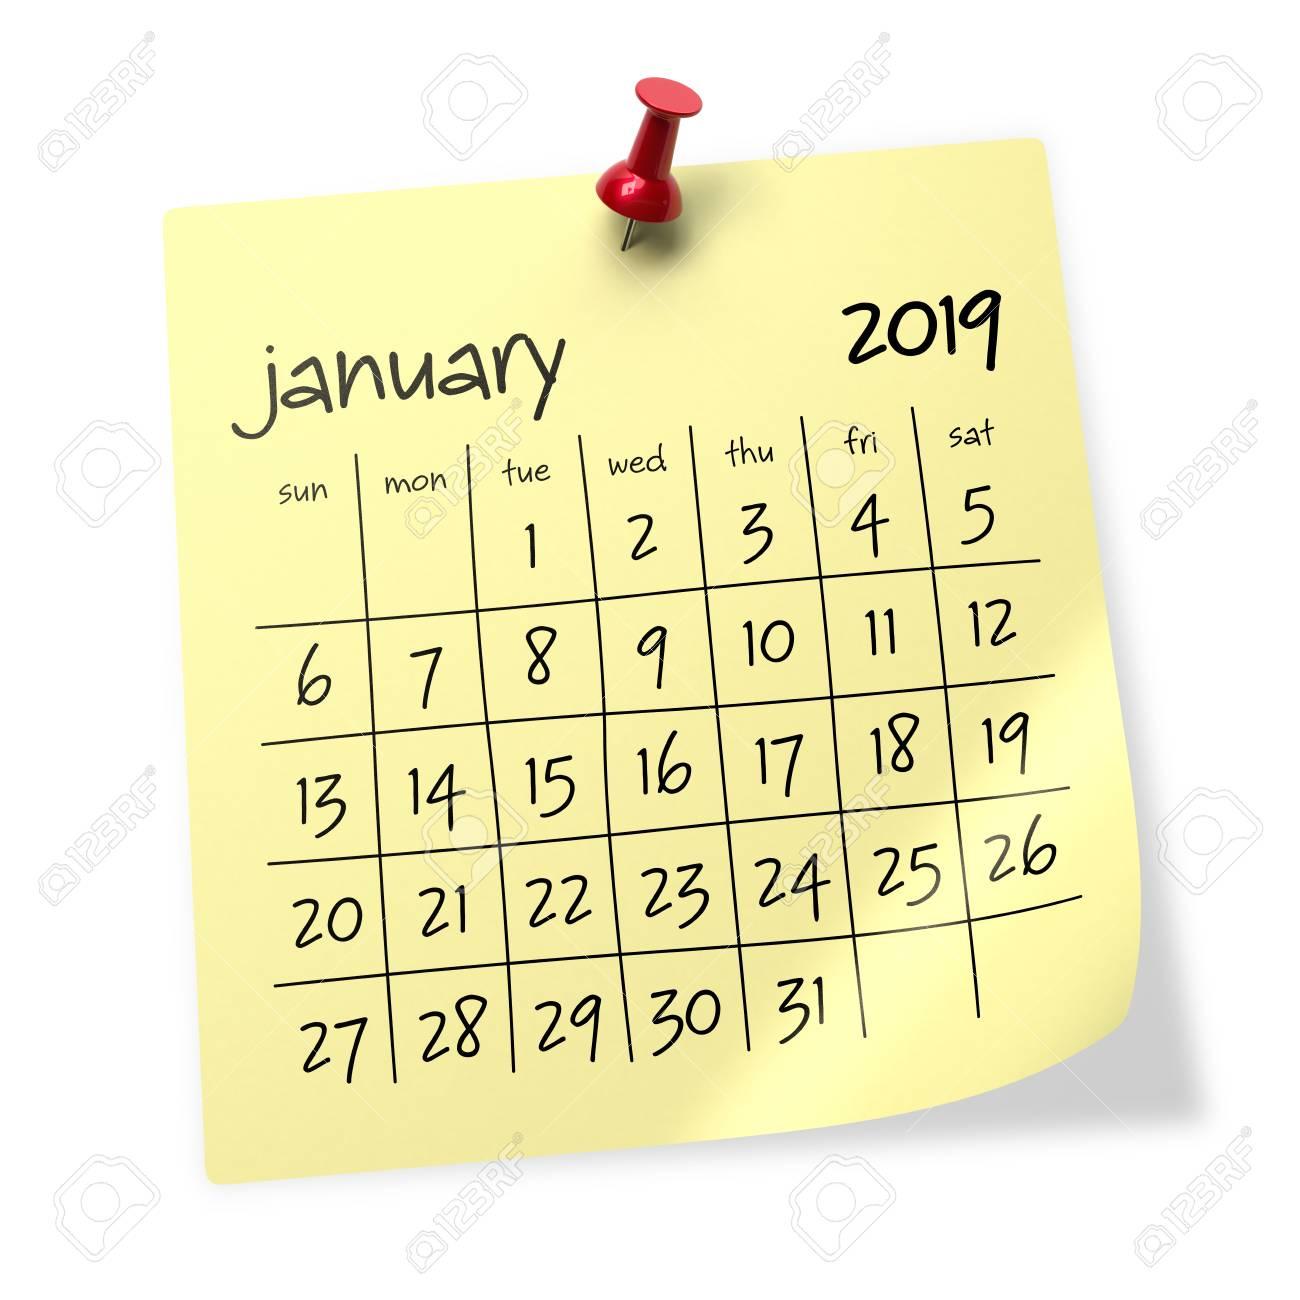 January 2019 Calendar For Background January 2019 Calendar. Isolated On White Background. 3D